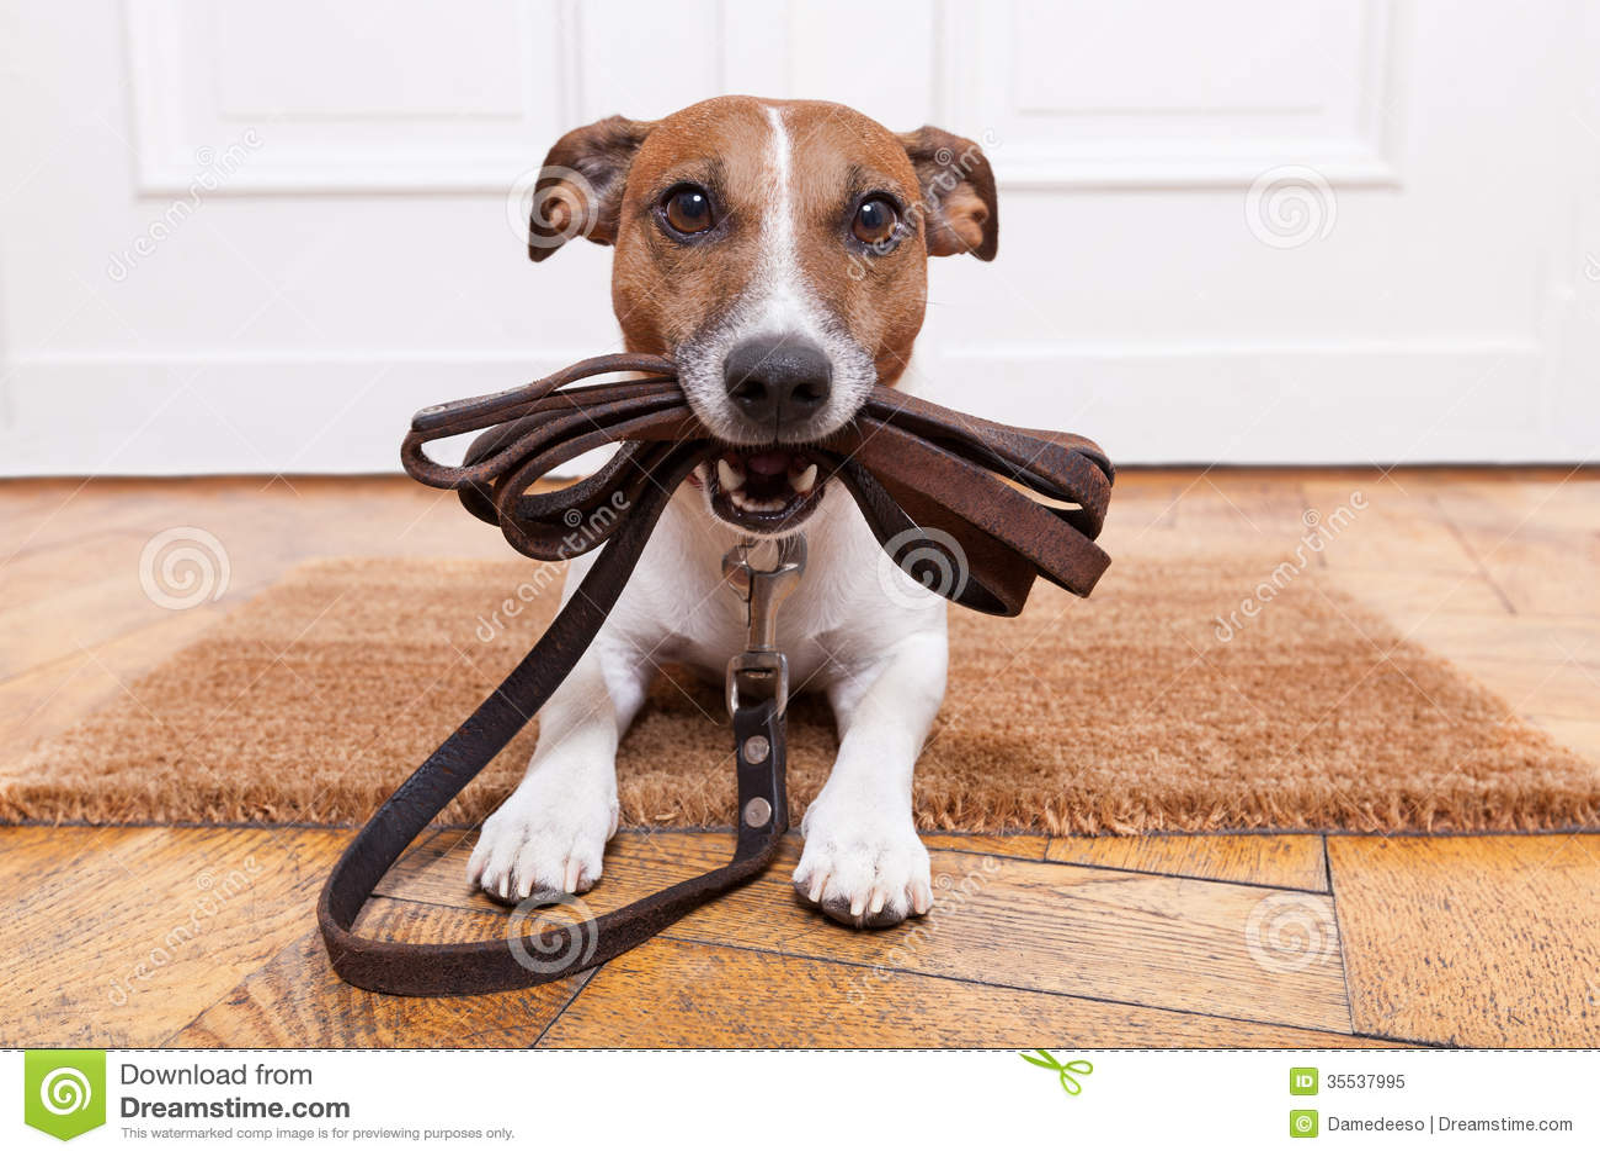 Go Walkies Dog Training